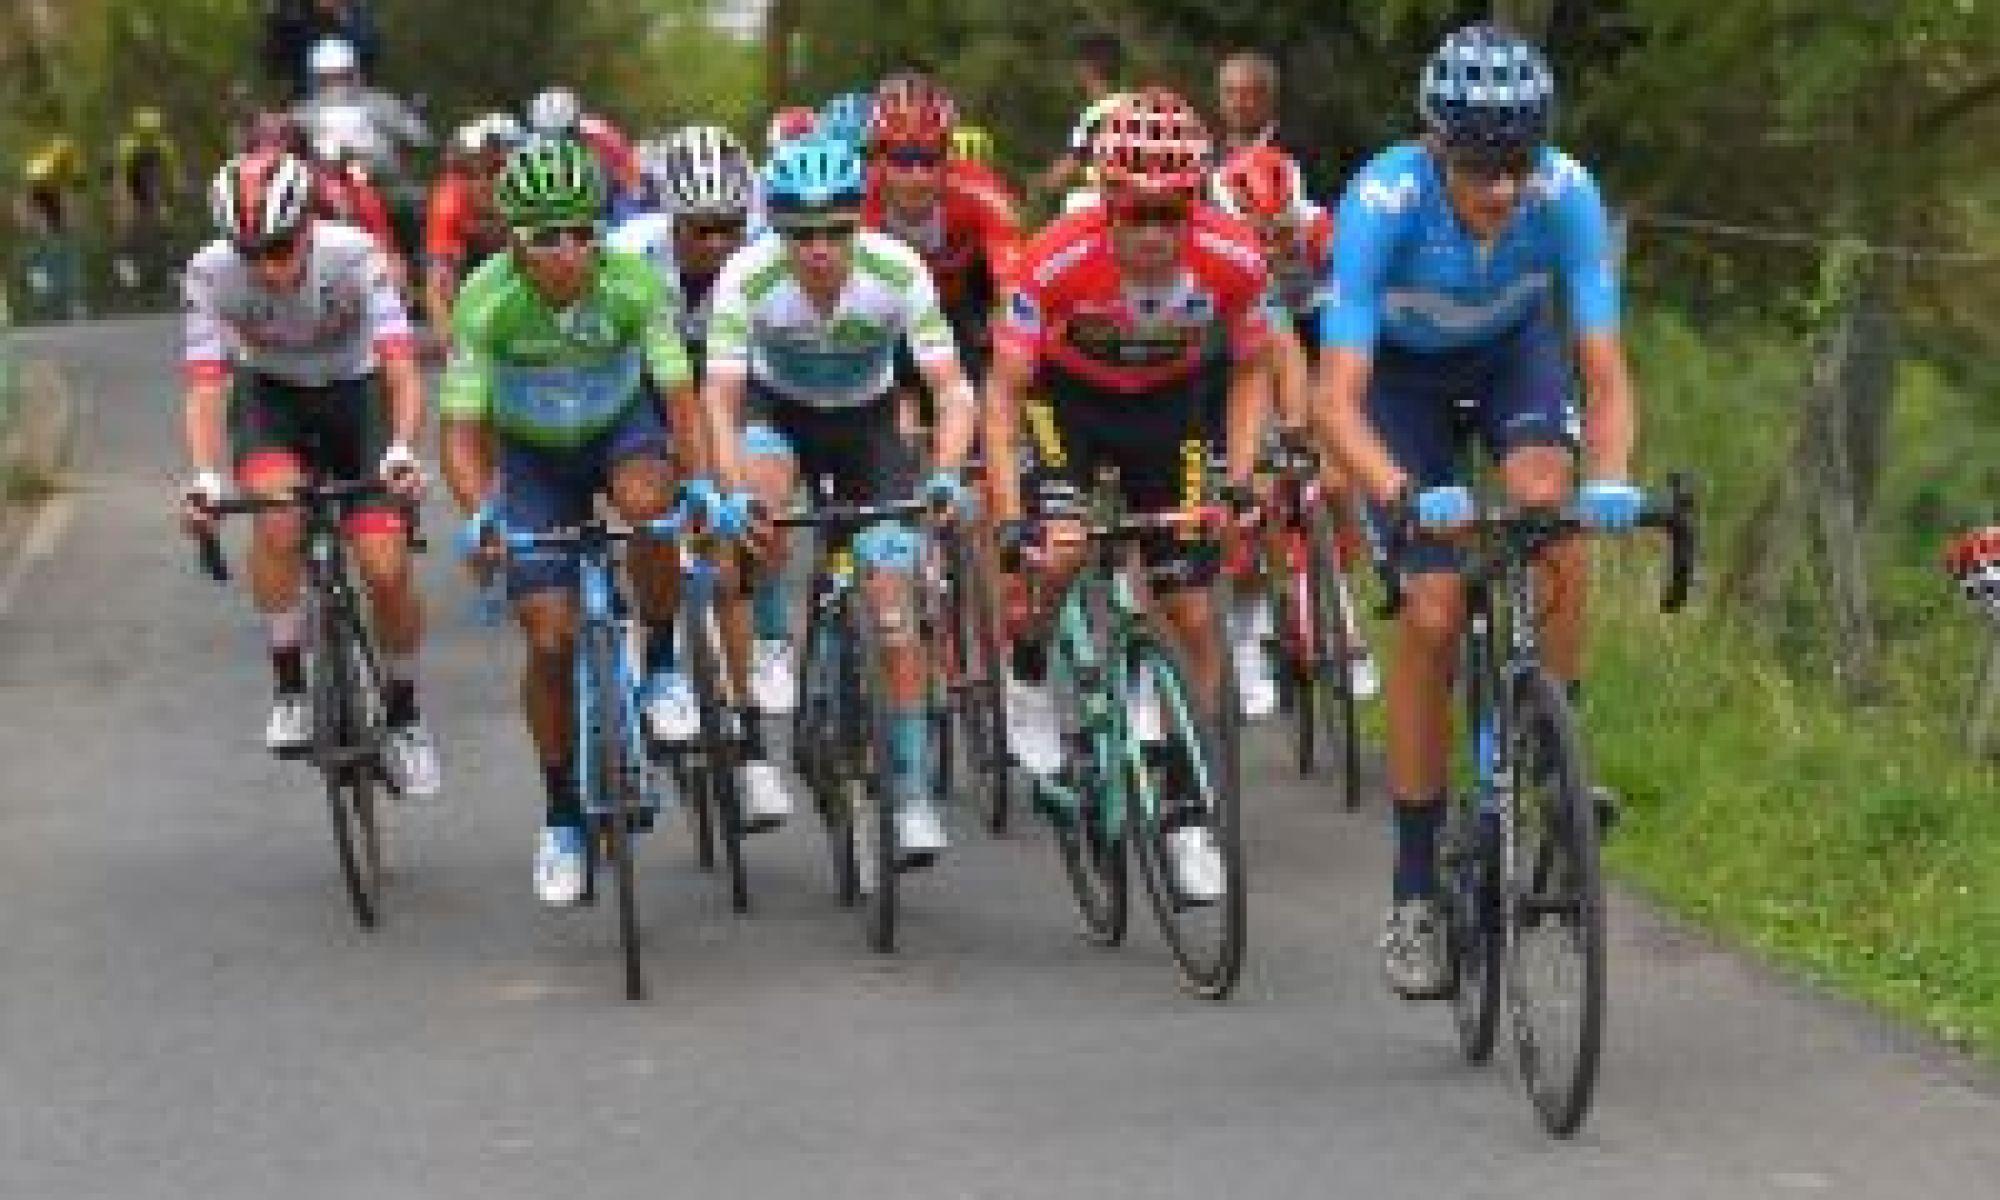 Vuelta a España 2020 start list: Froome, Roglič, Dumoulin, Vlasov and Pinot among strong line-up